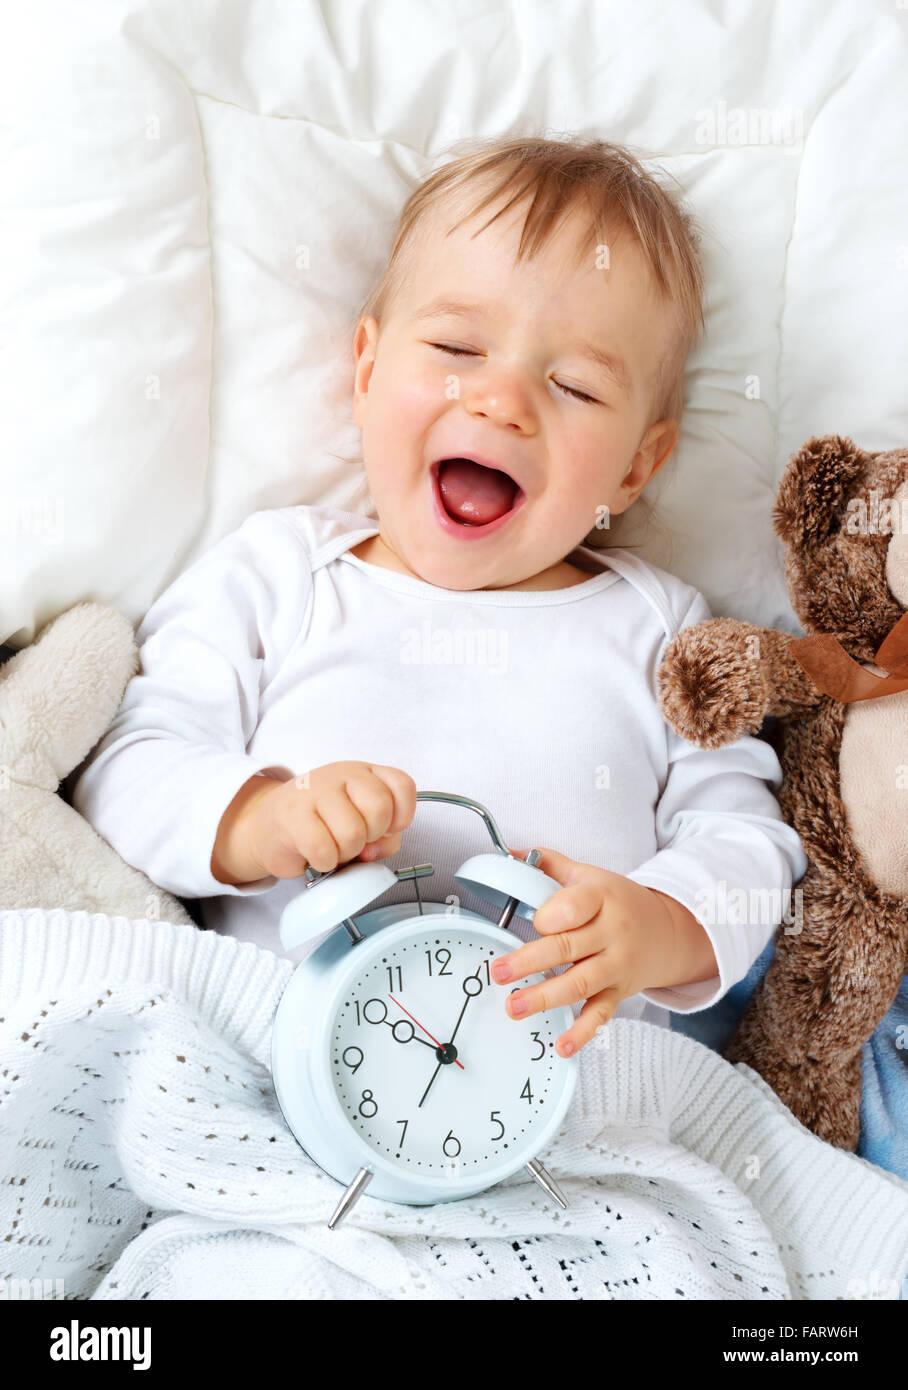 Un an bébé avec réveil Photo Stock